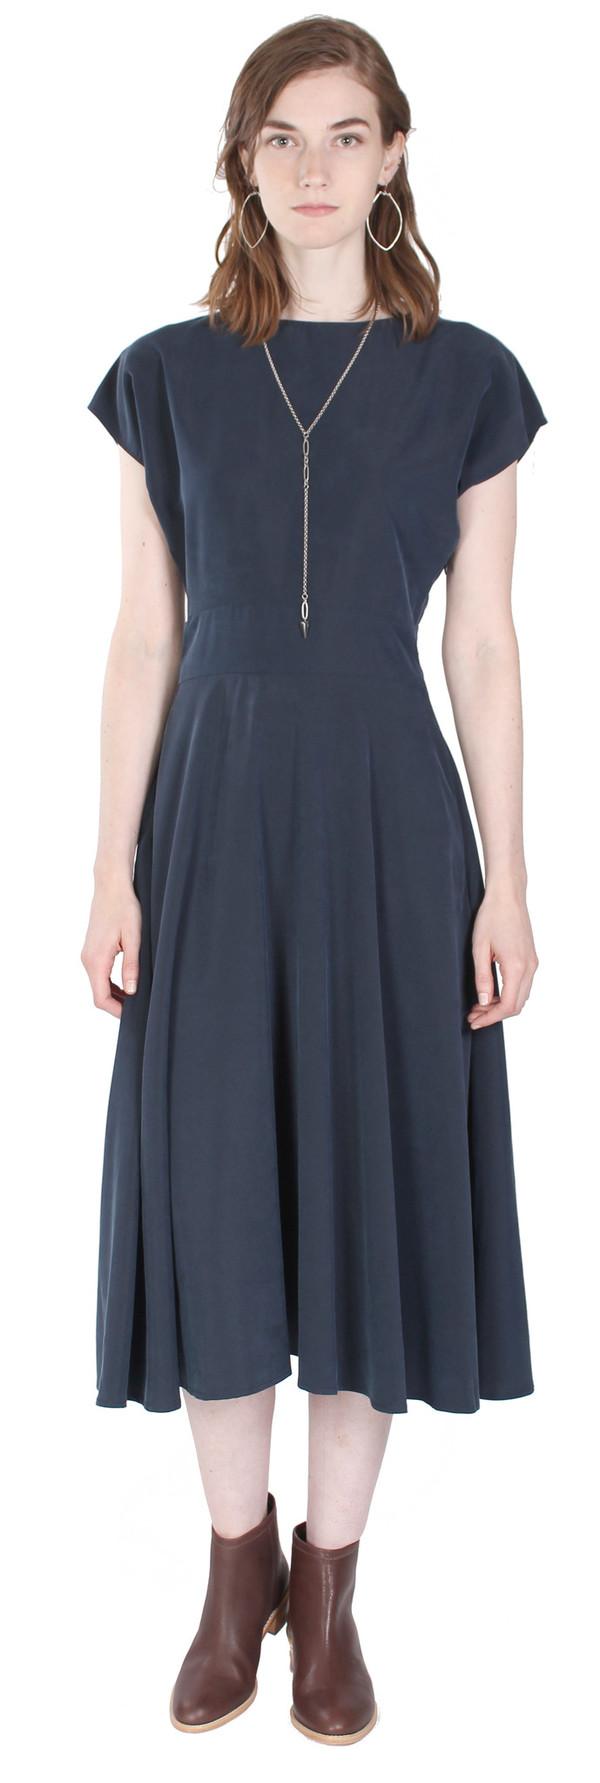 Curator Etta Dress